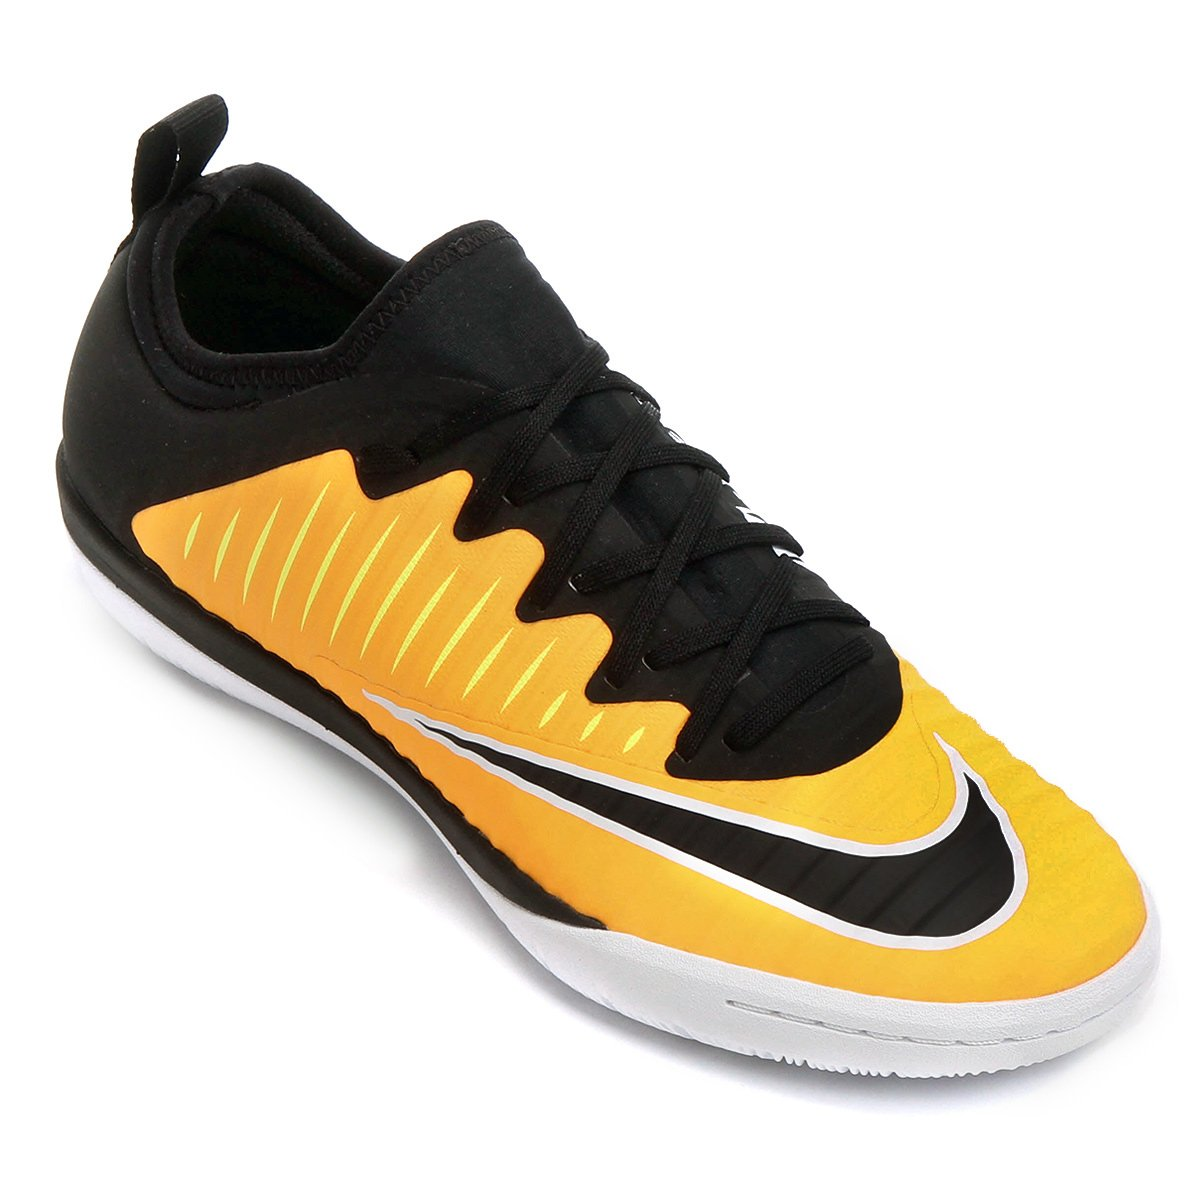 e932b331c14ef Chuteira Futsal Nike Mercurial Finale 2 IC - Compre Agora